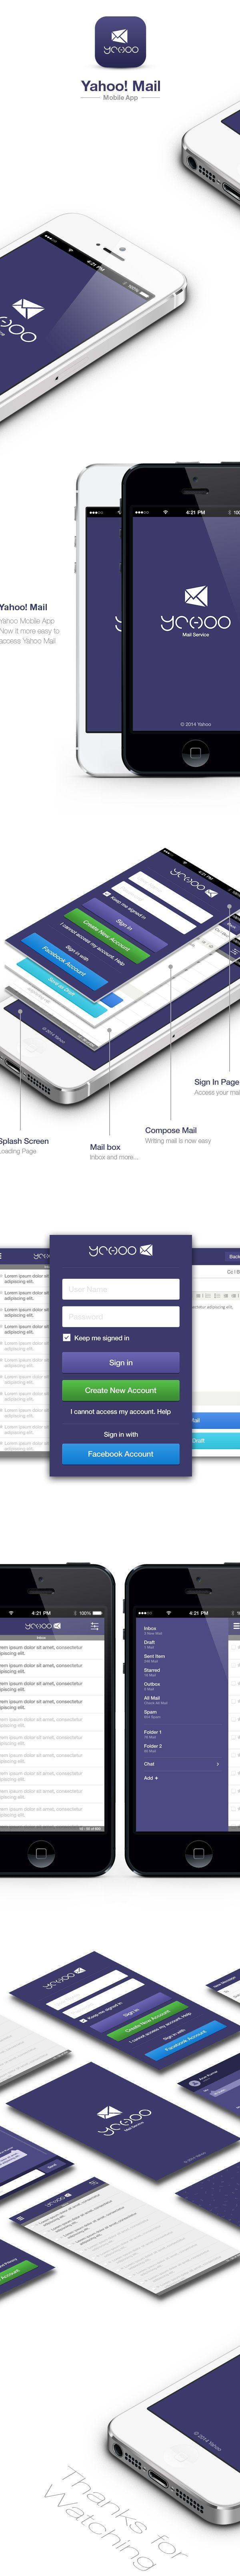 Yahoo Mail App Design by Mani Bharathi, via Behance